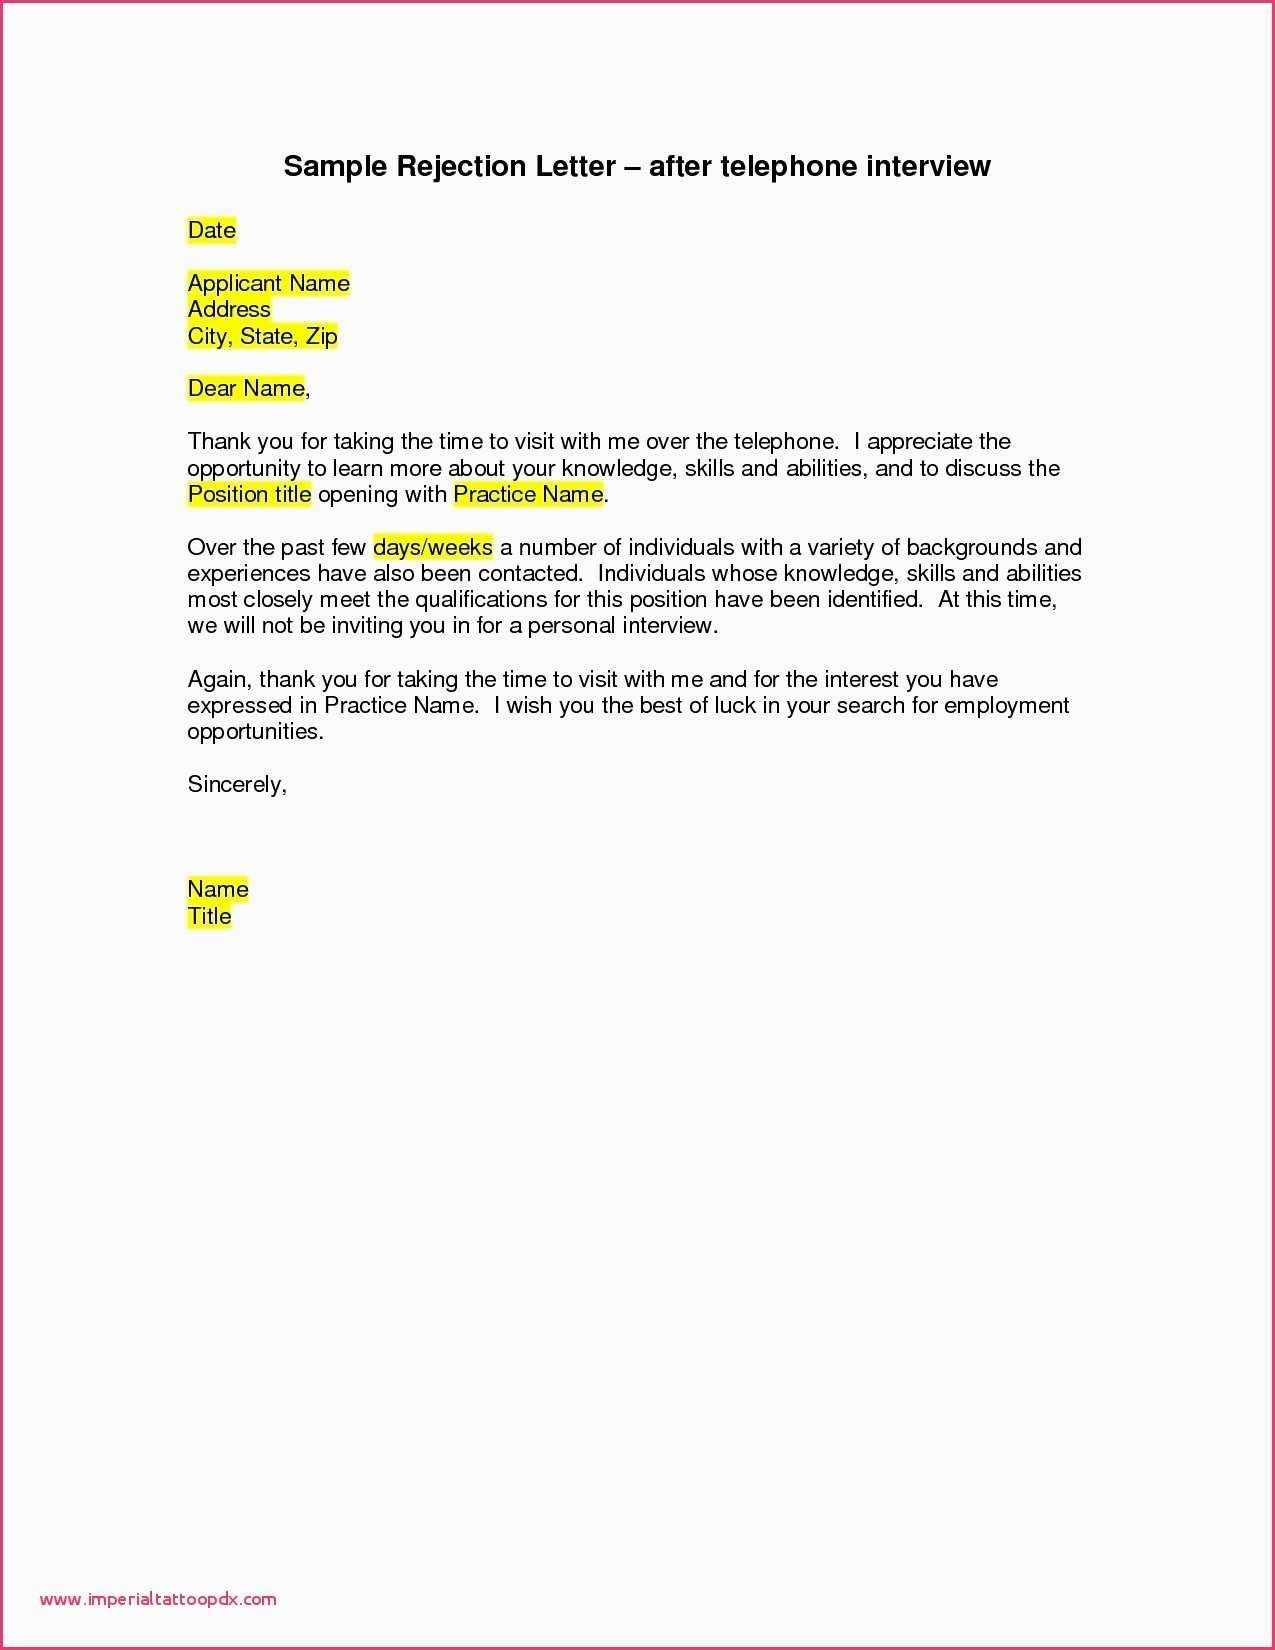 New Job Rejection Thank You Letter Sample Job rejection